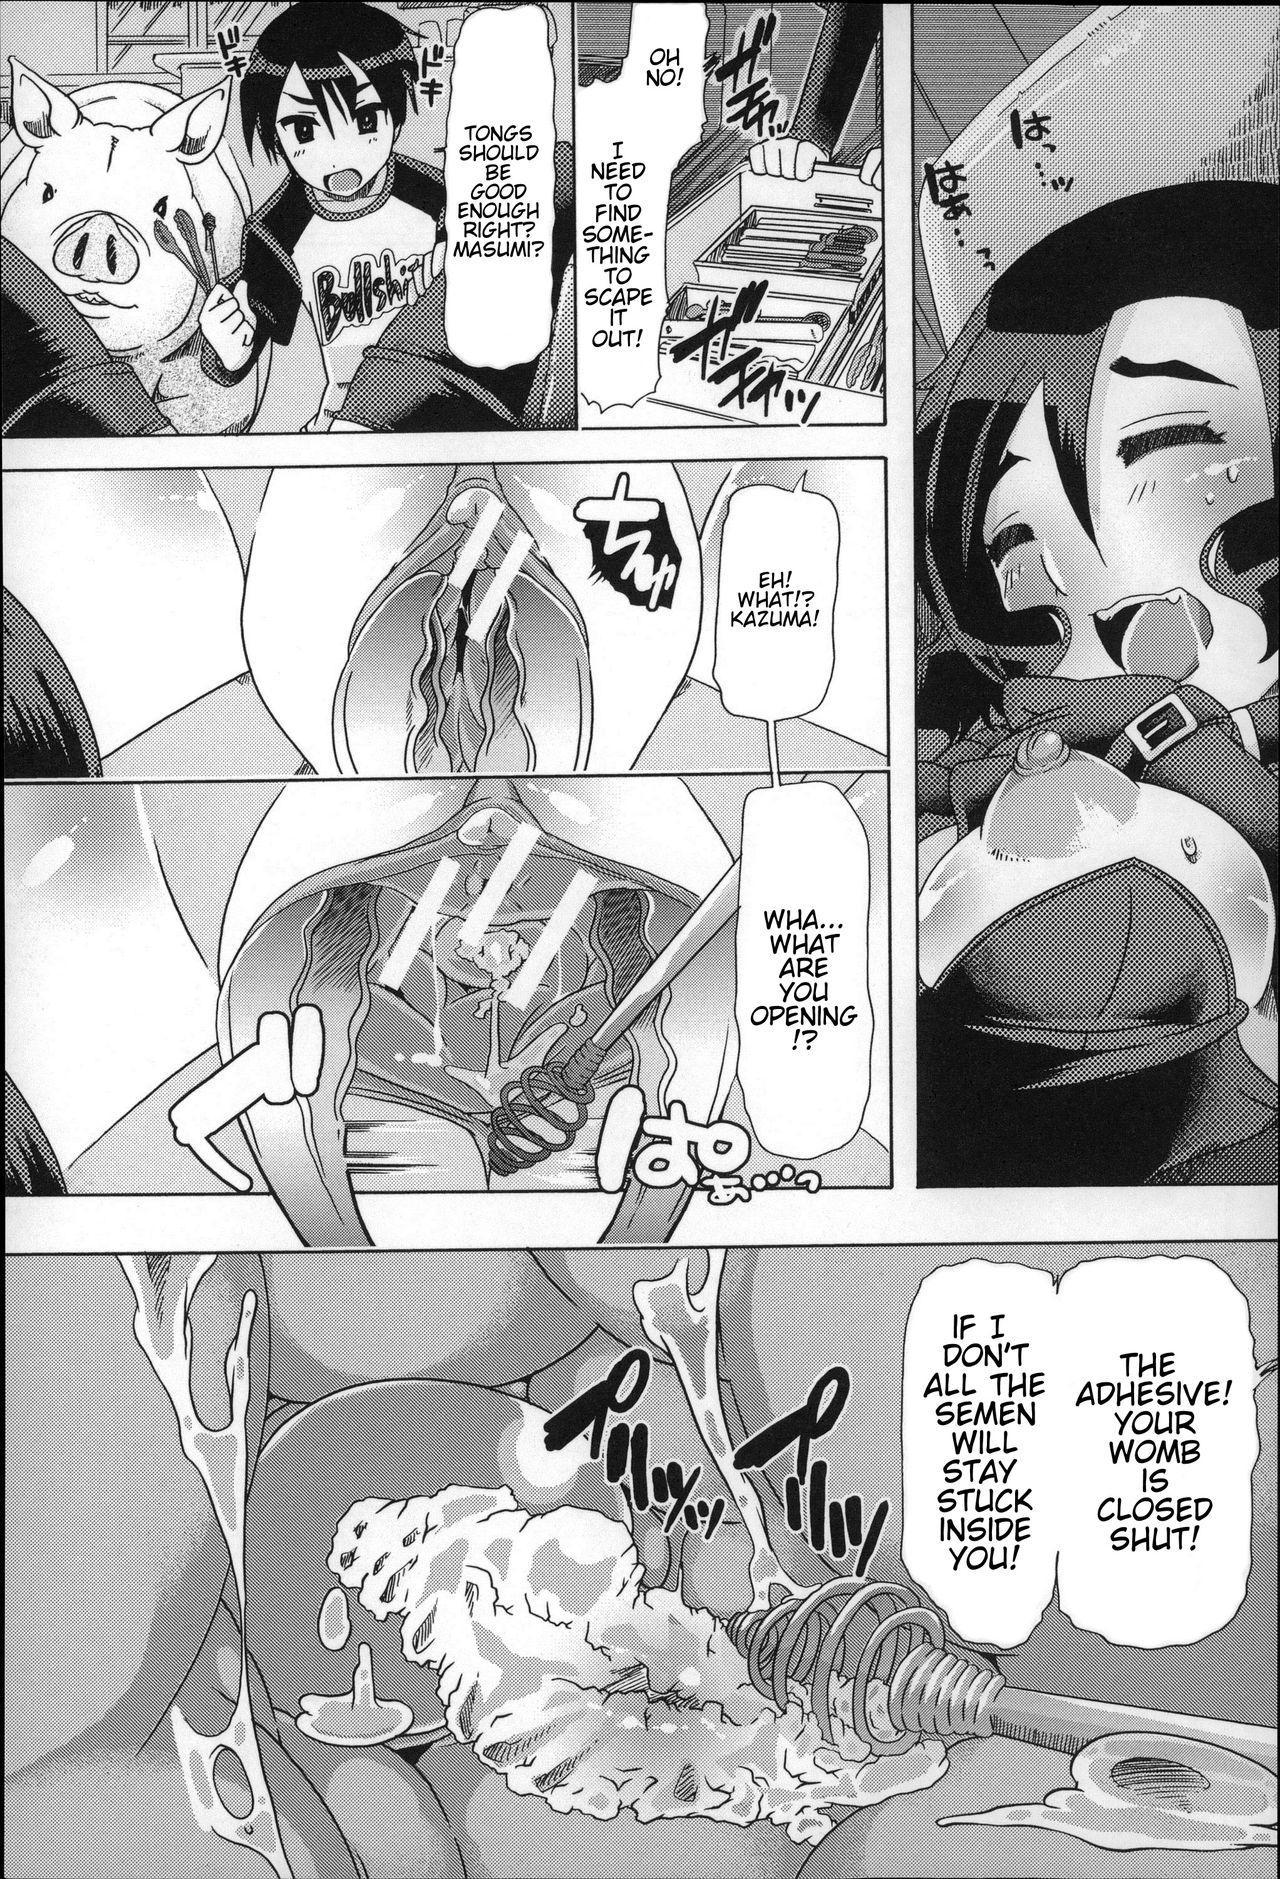 [Chikiko] Juukan - Tonkatsu   Bestiality - Pork Life (Cutlet) (Juukan Nikubenki Kasumi) [English] [Neeko7] 25